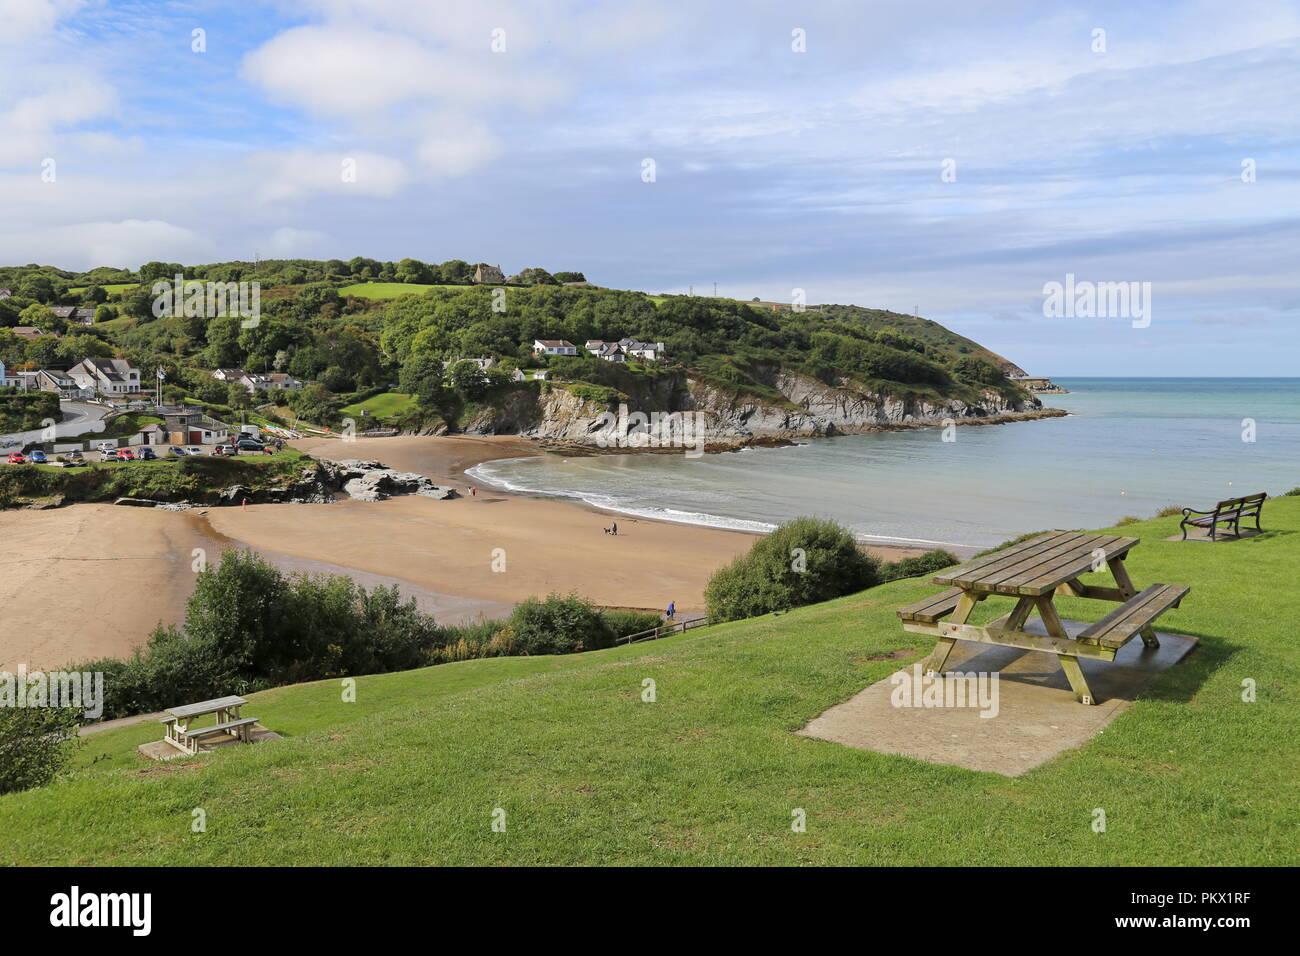 Dyffryn and Dolwen beaches, Aberporth, Cardigan Bay, Ceredigion, Wales, Great Britain, United Kingdom, UK, Europe - Stock Image